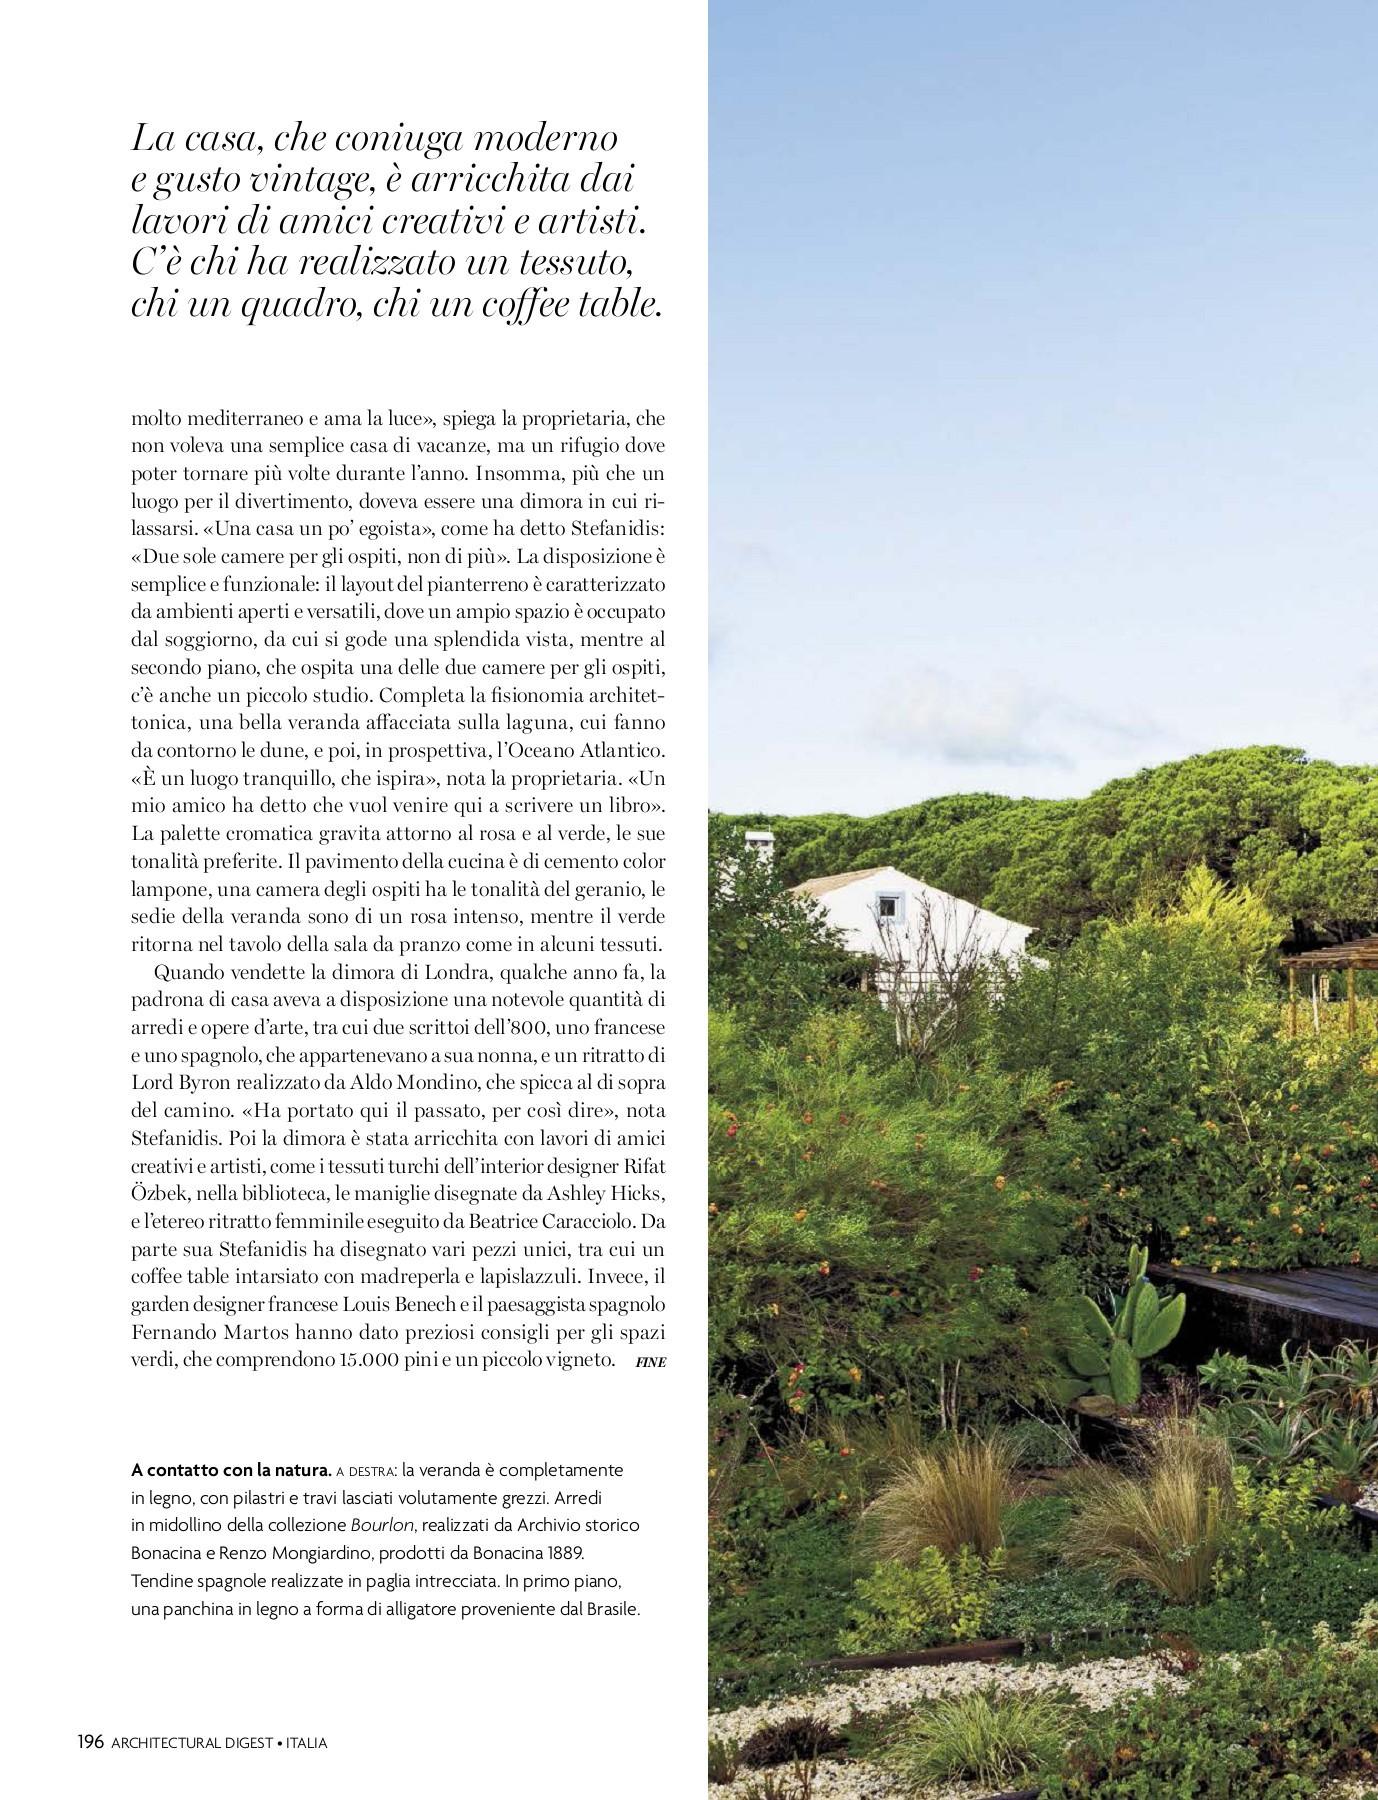 La Veranda Di Campagna architectural digest italia_oct 2017-flip book pages 201-229